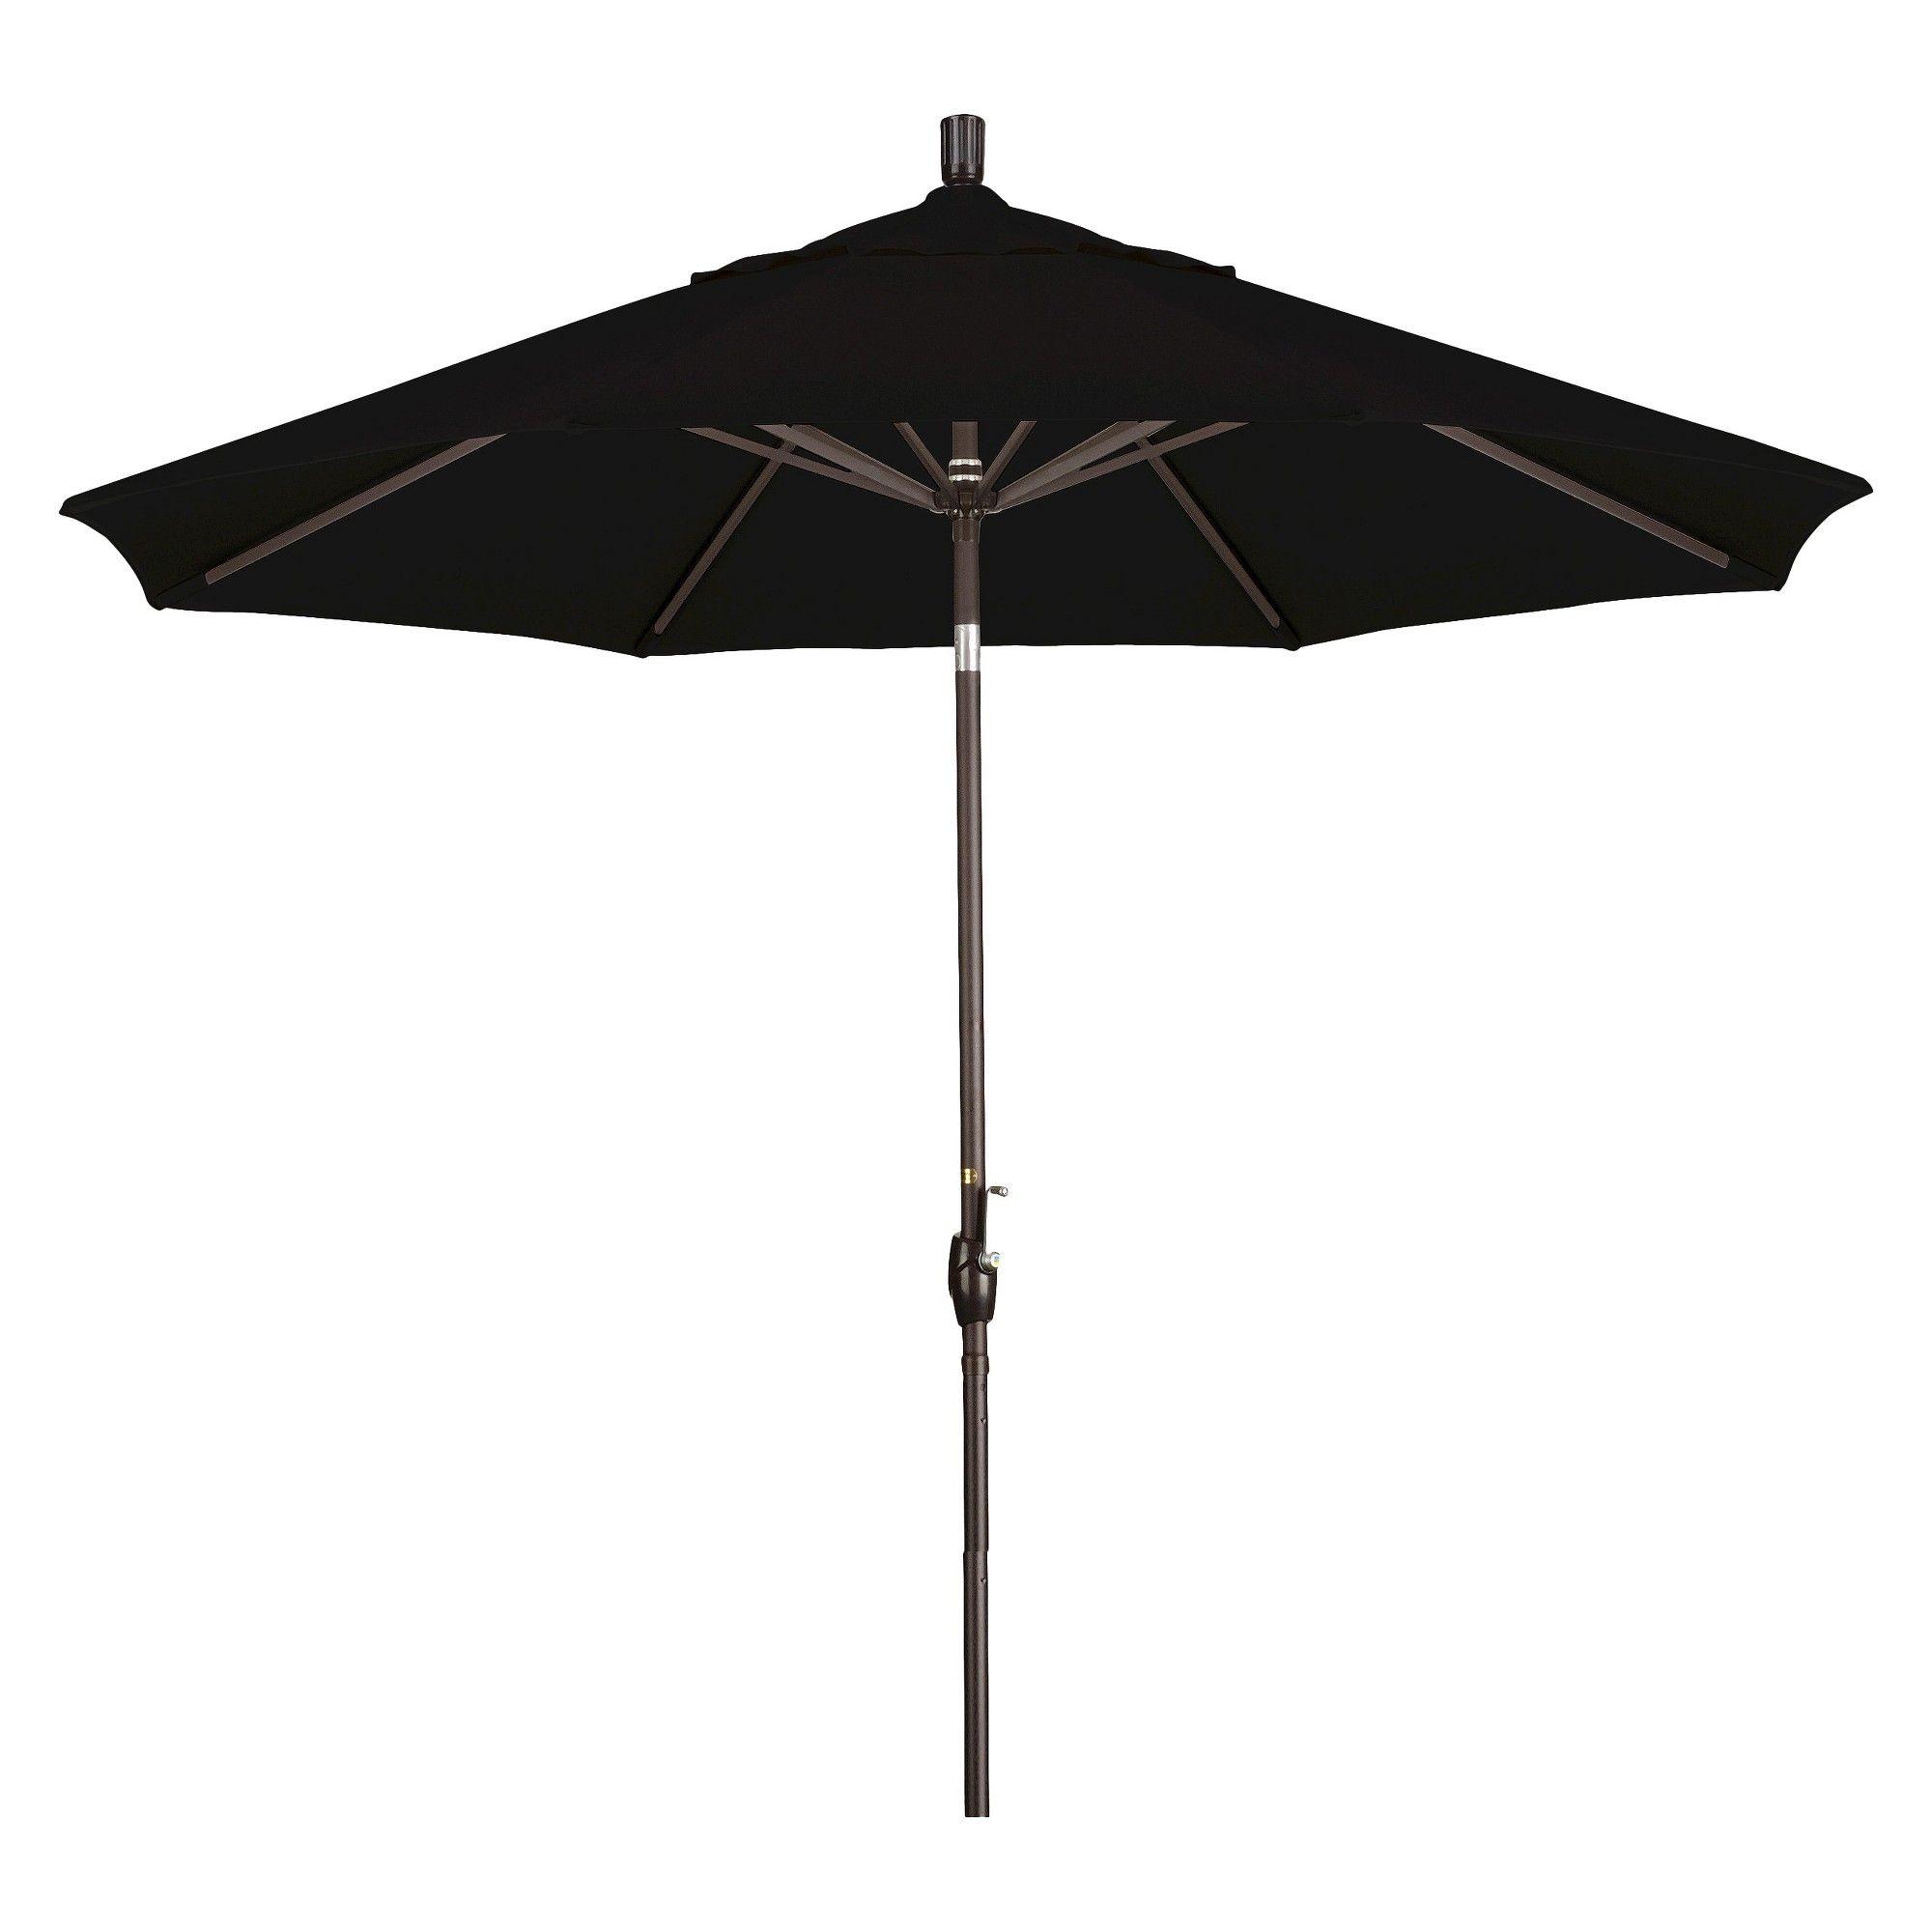 9 Aluminum Push Button Tilt Crank Patio Umbrella Black